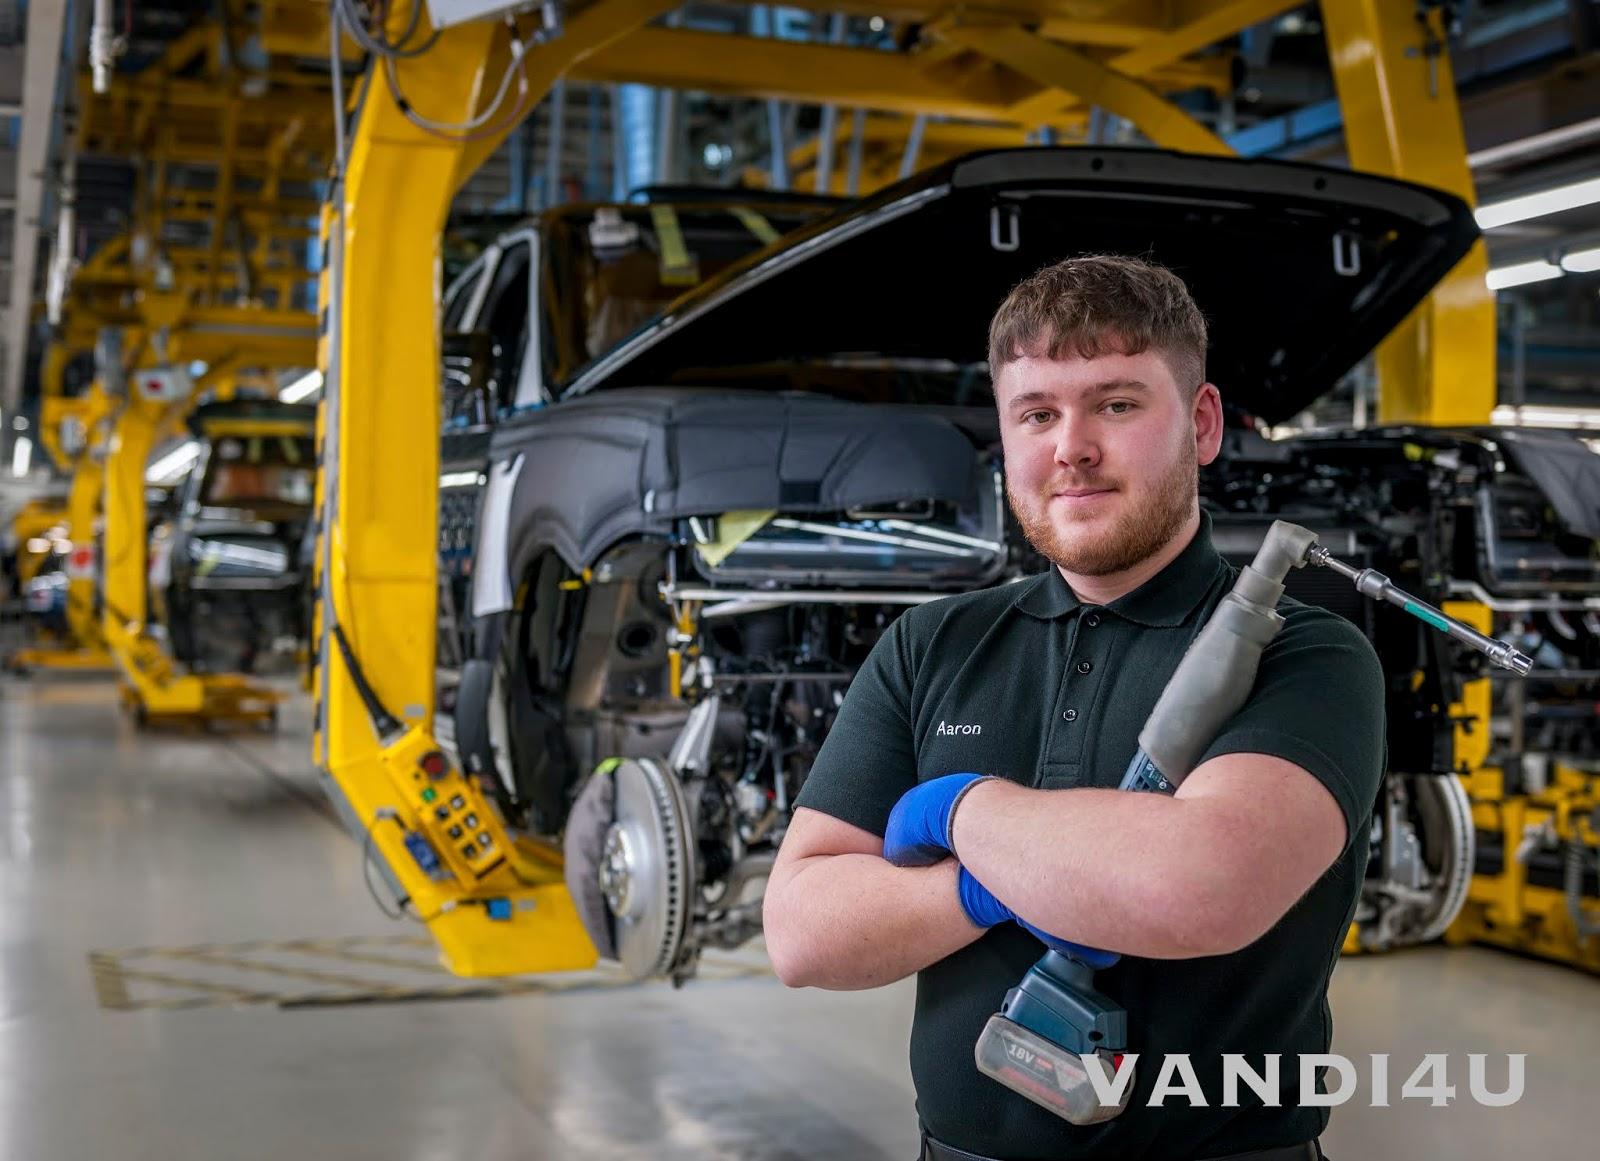 Rolls Royce Motor Cars invites applications for 2020 Apprenticeship Programme   VANDI4U